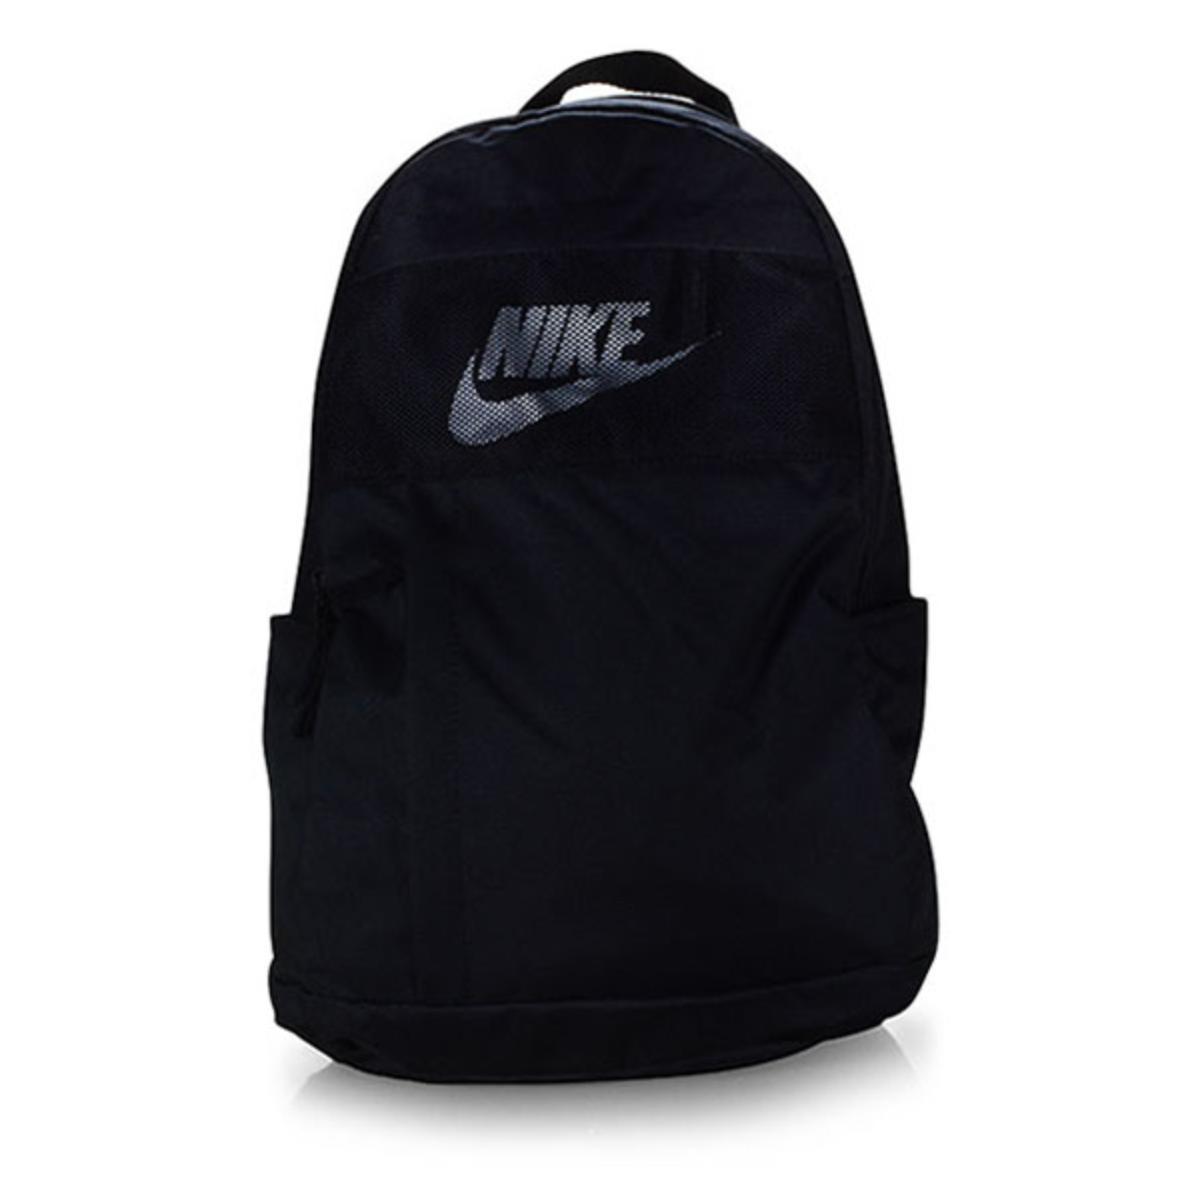 Mochila Unisex Nike Ba5878-010 Elmntl Bkpk Preto/branco